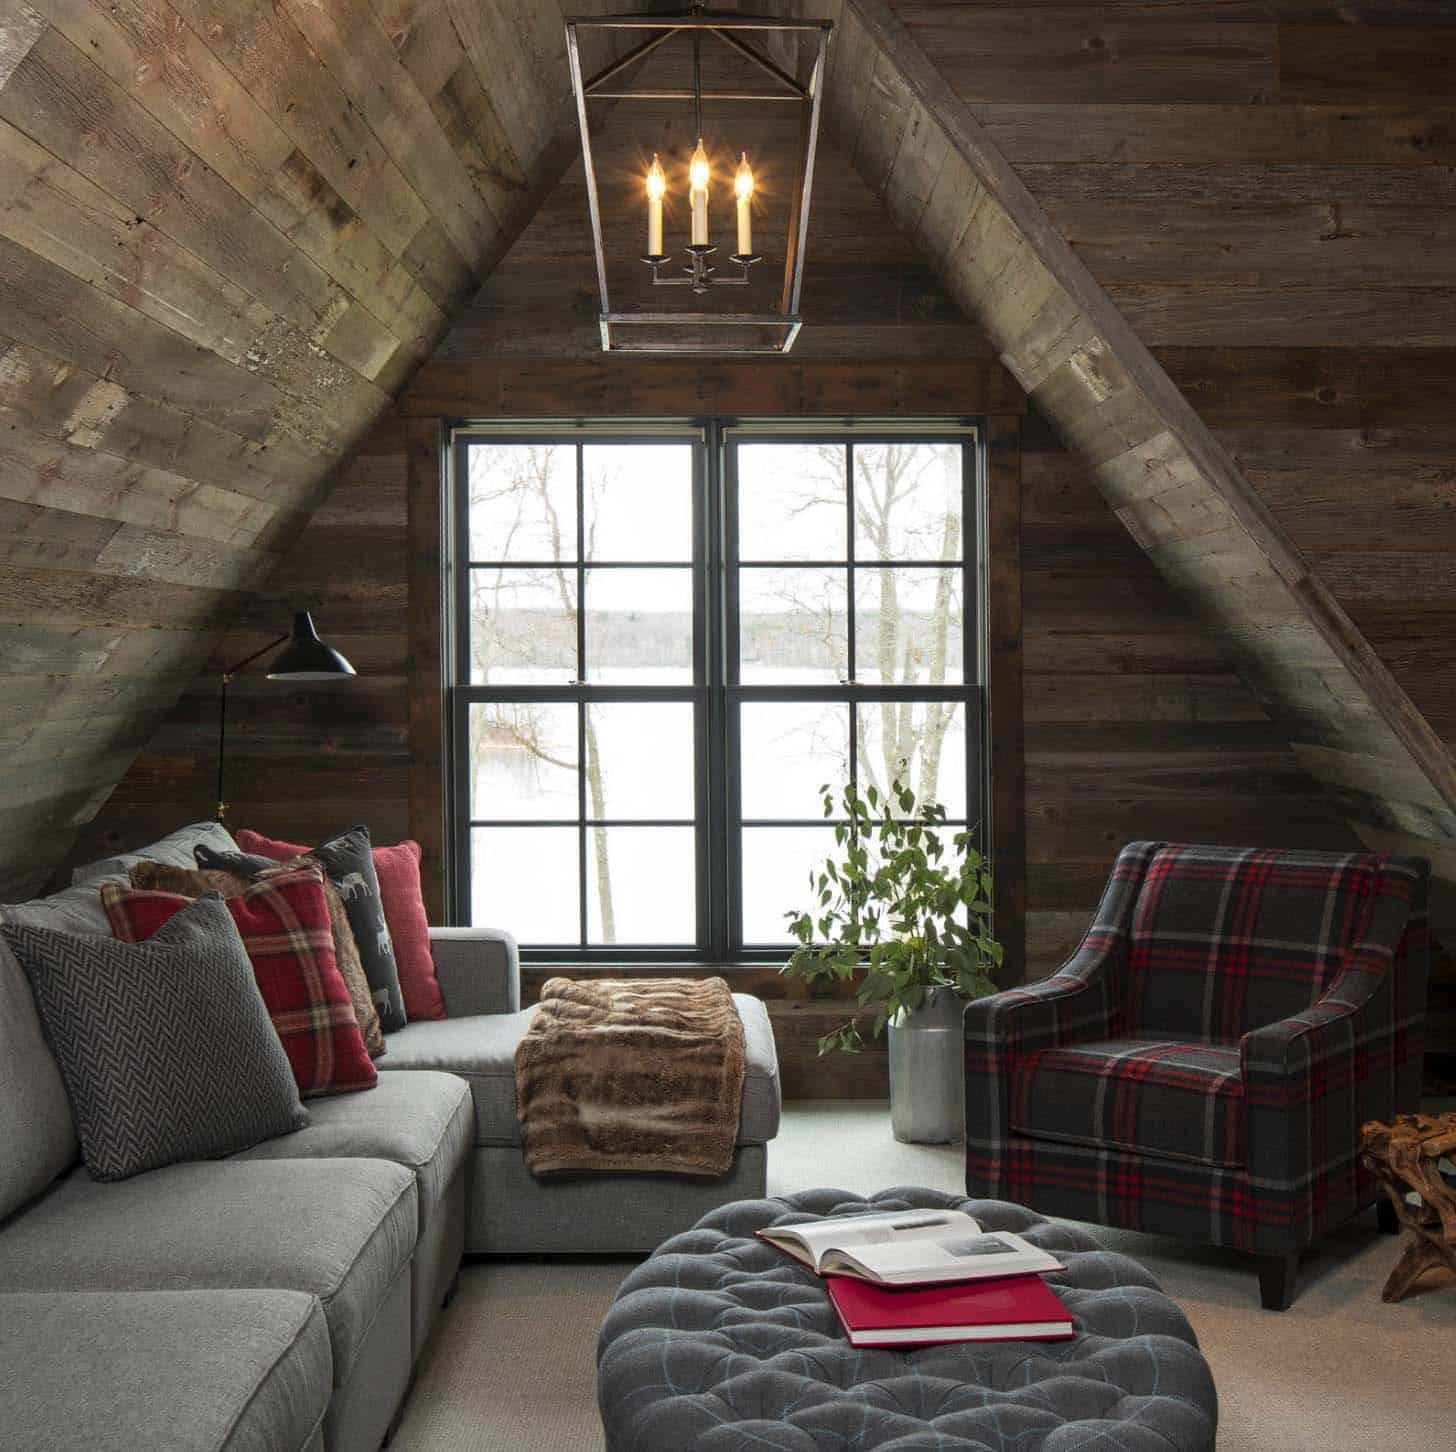 Rustic Lake House-Martha OHara Interiors-13-1 Kindesign